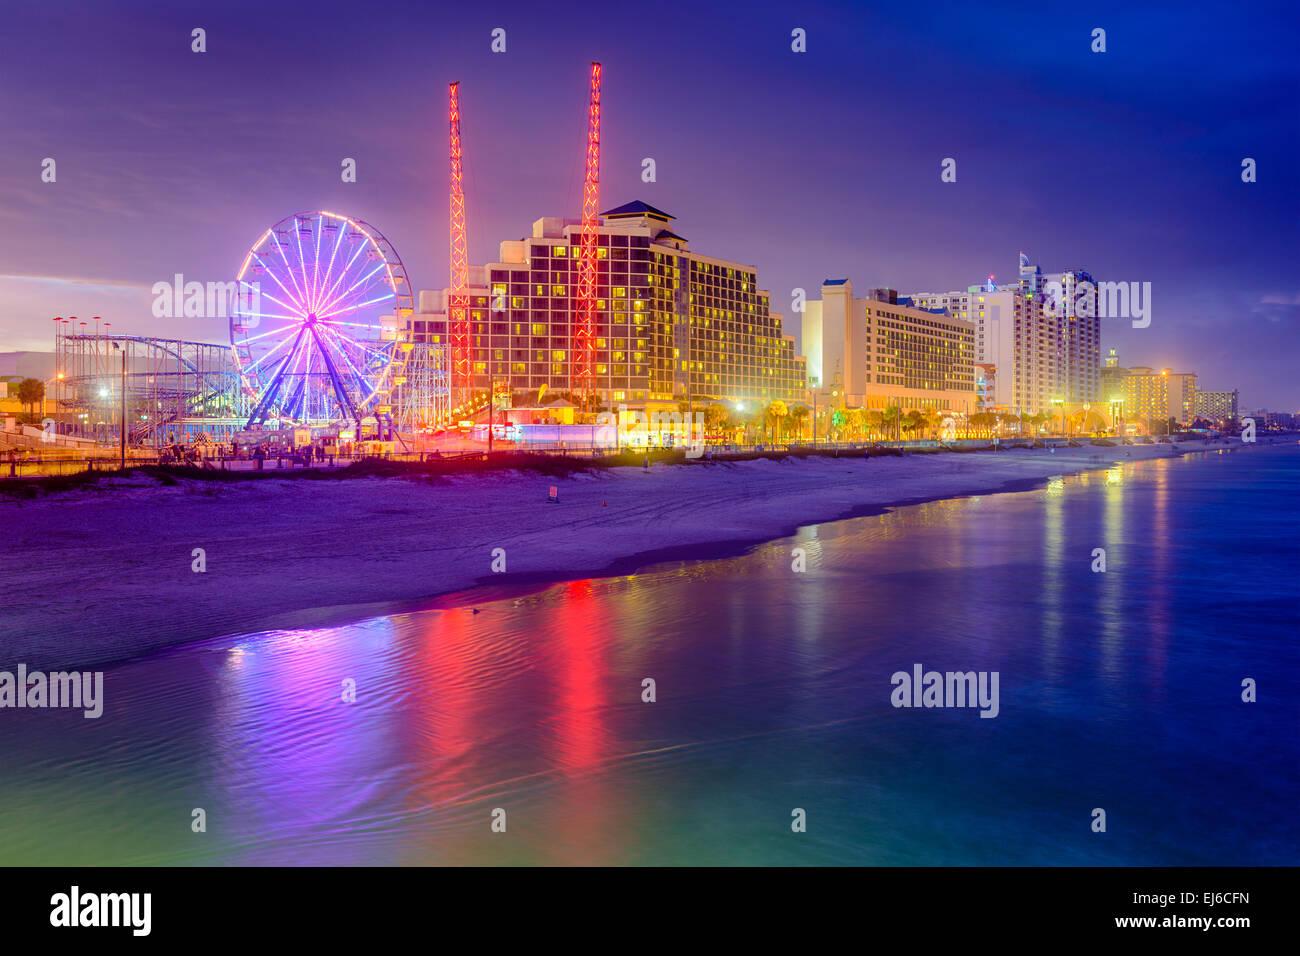 Daytona Beach, Florida, USA am Strand-resorts Skyline. Stockbild